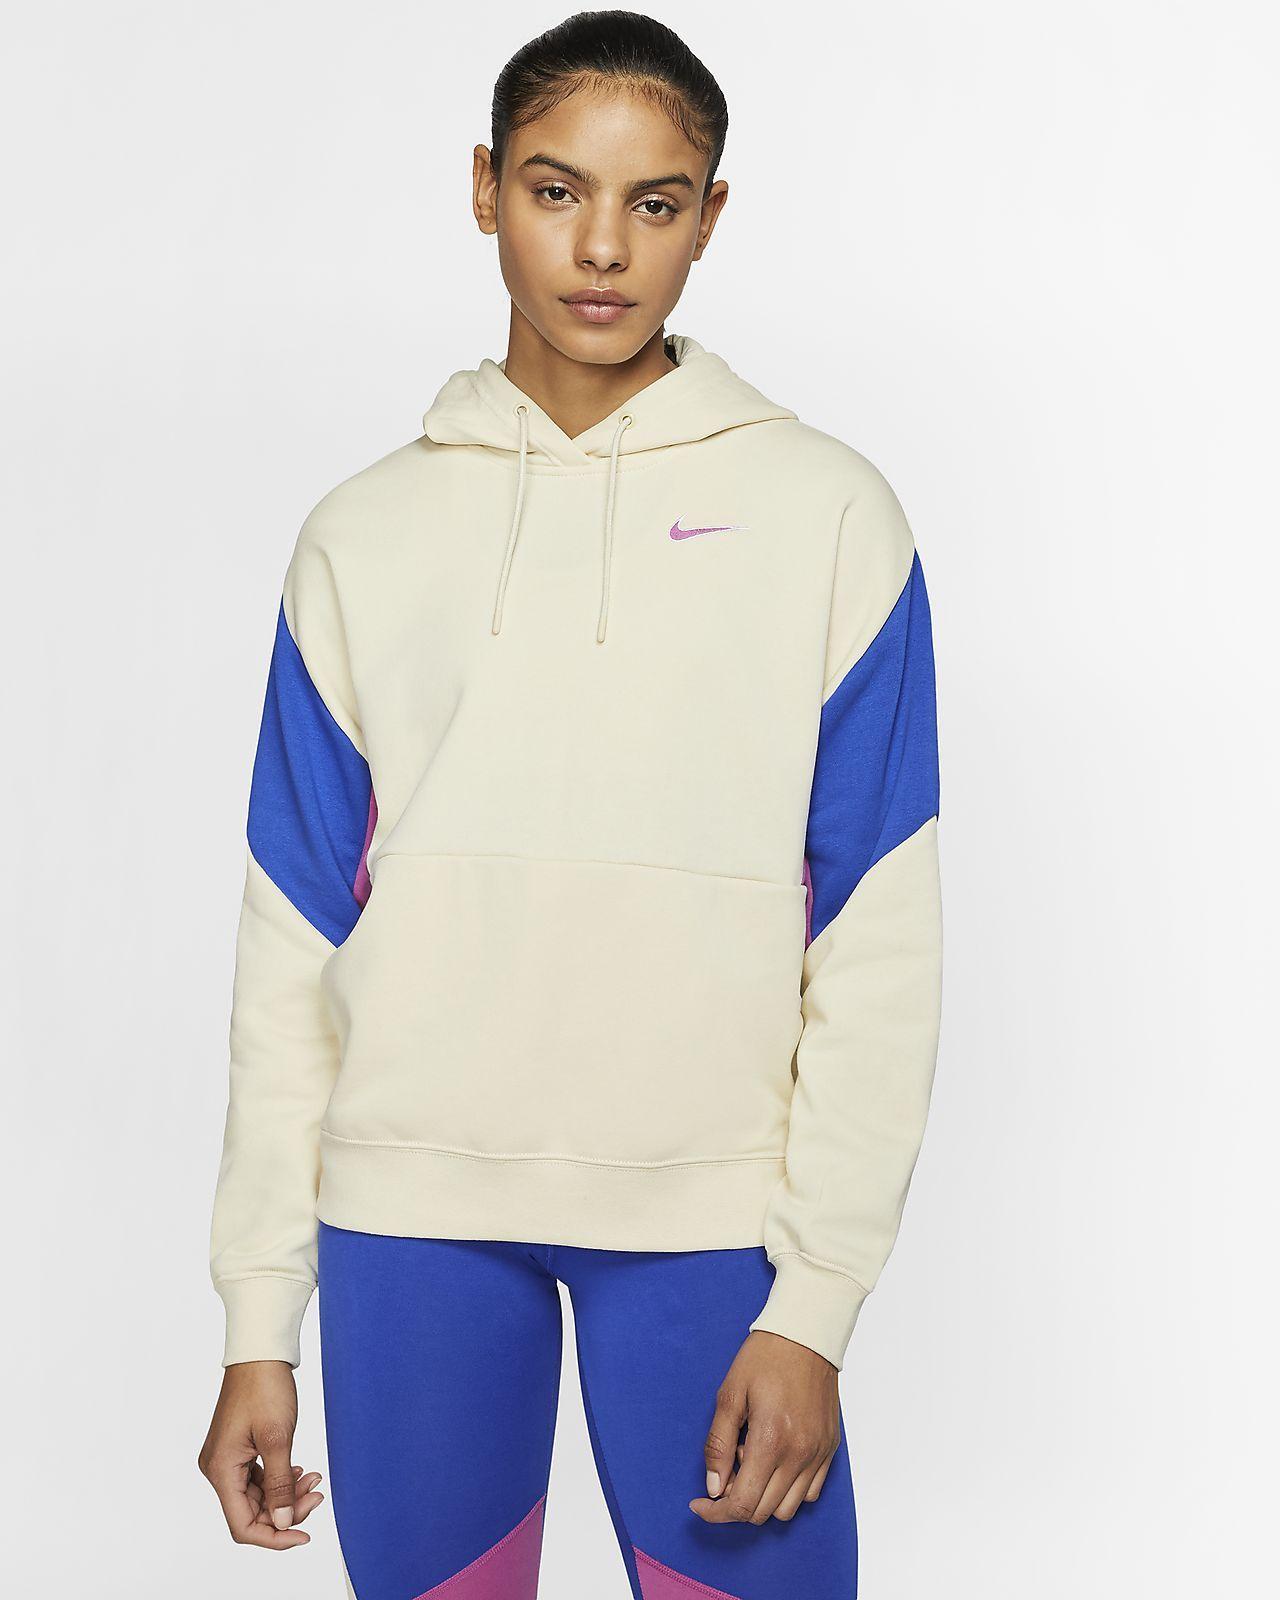 Nike Sportswear Women S French Terry Pullover Hoodie Nike Com Nike Sportbekleidung Kapuzenpullover [ 1600 x 1280 Pixel ]